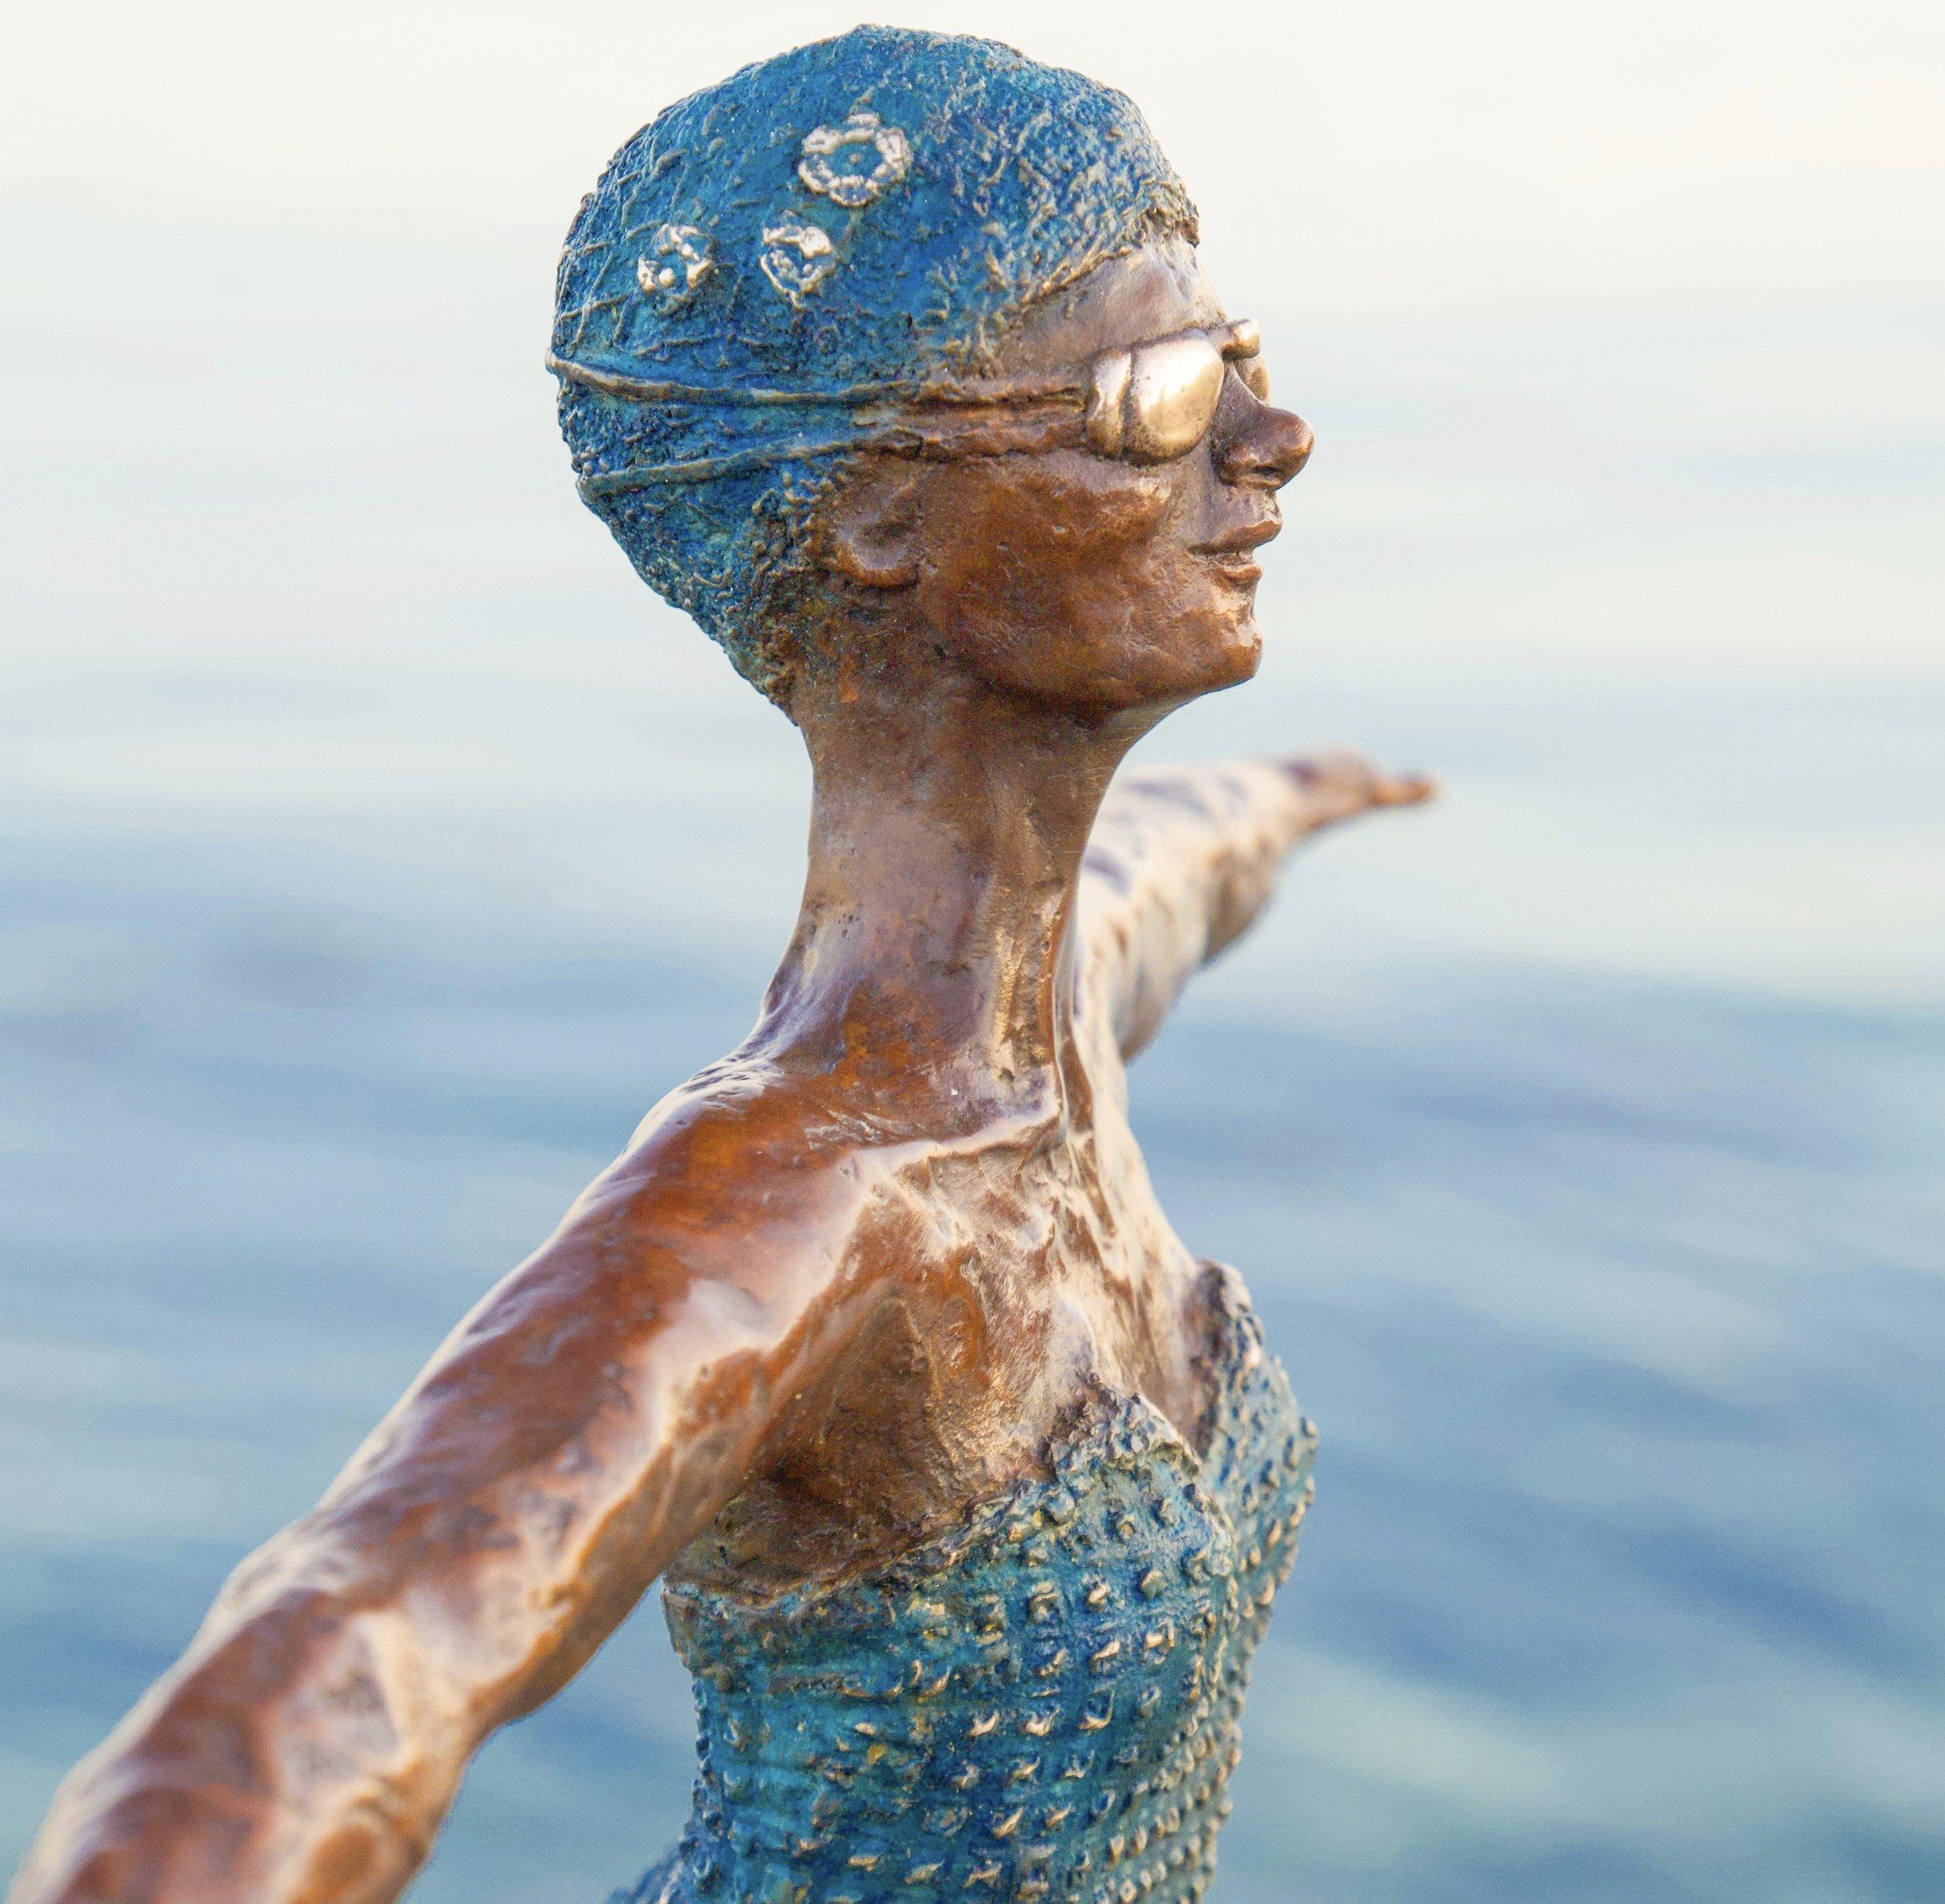 Diving into the ocean ~ bronze swimmer (2018)